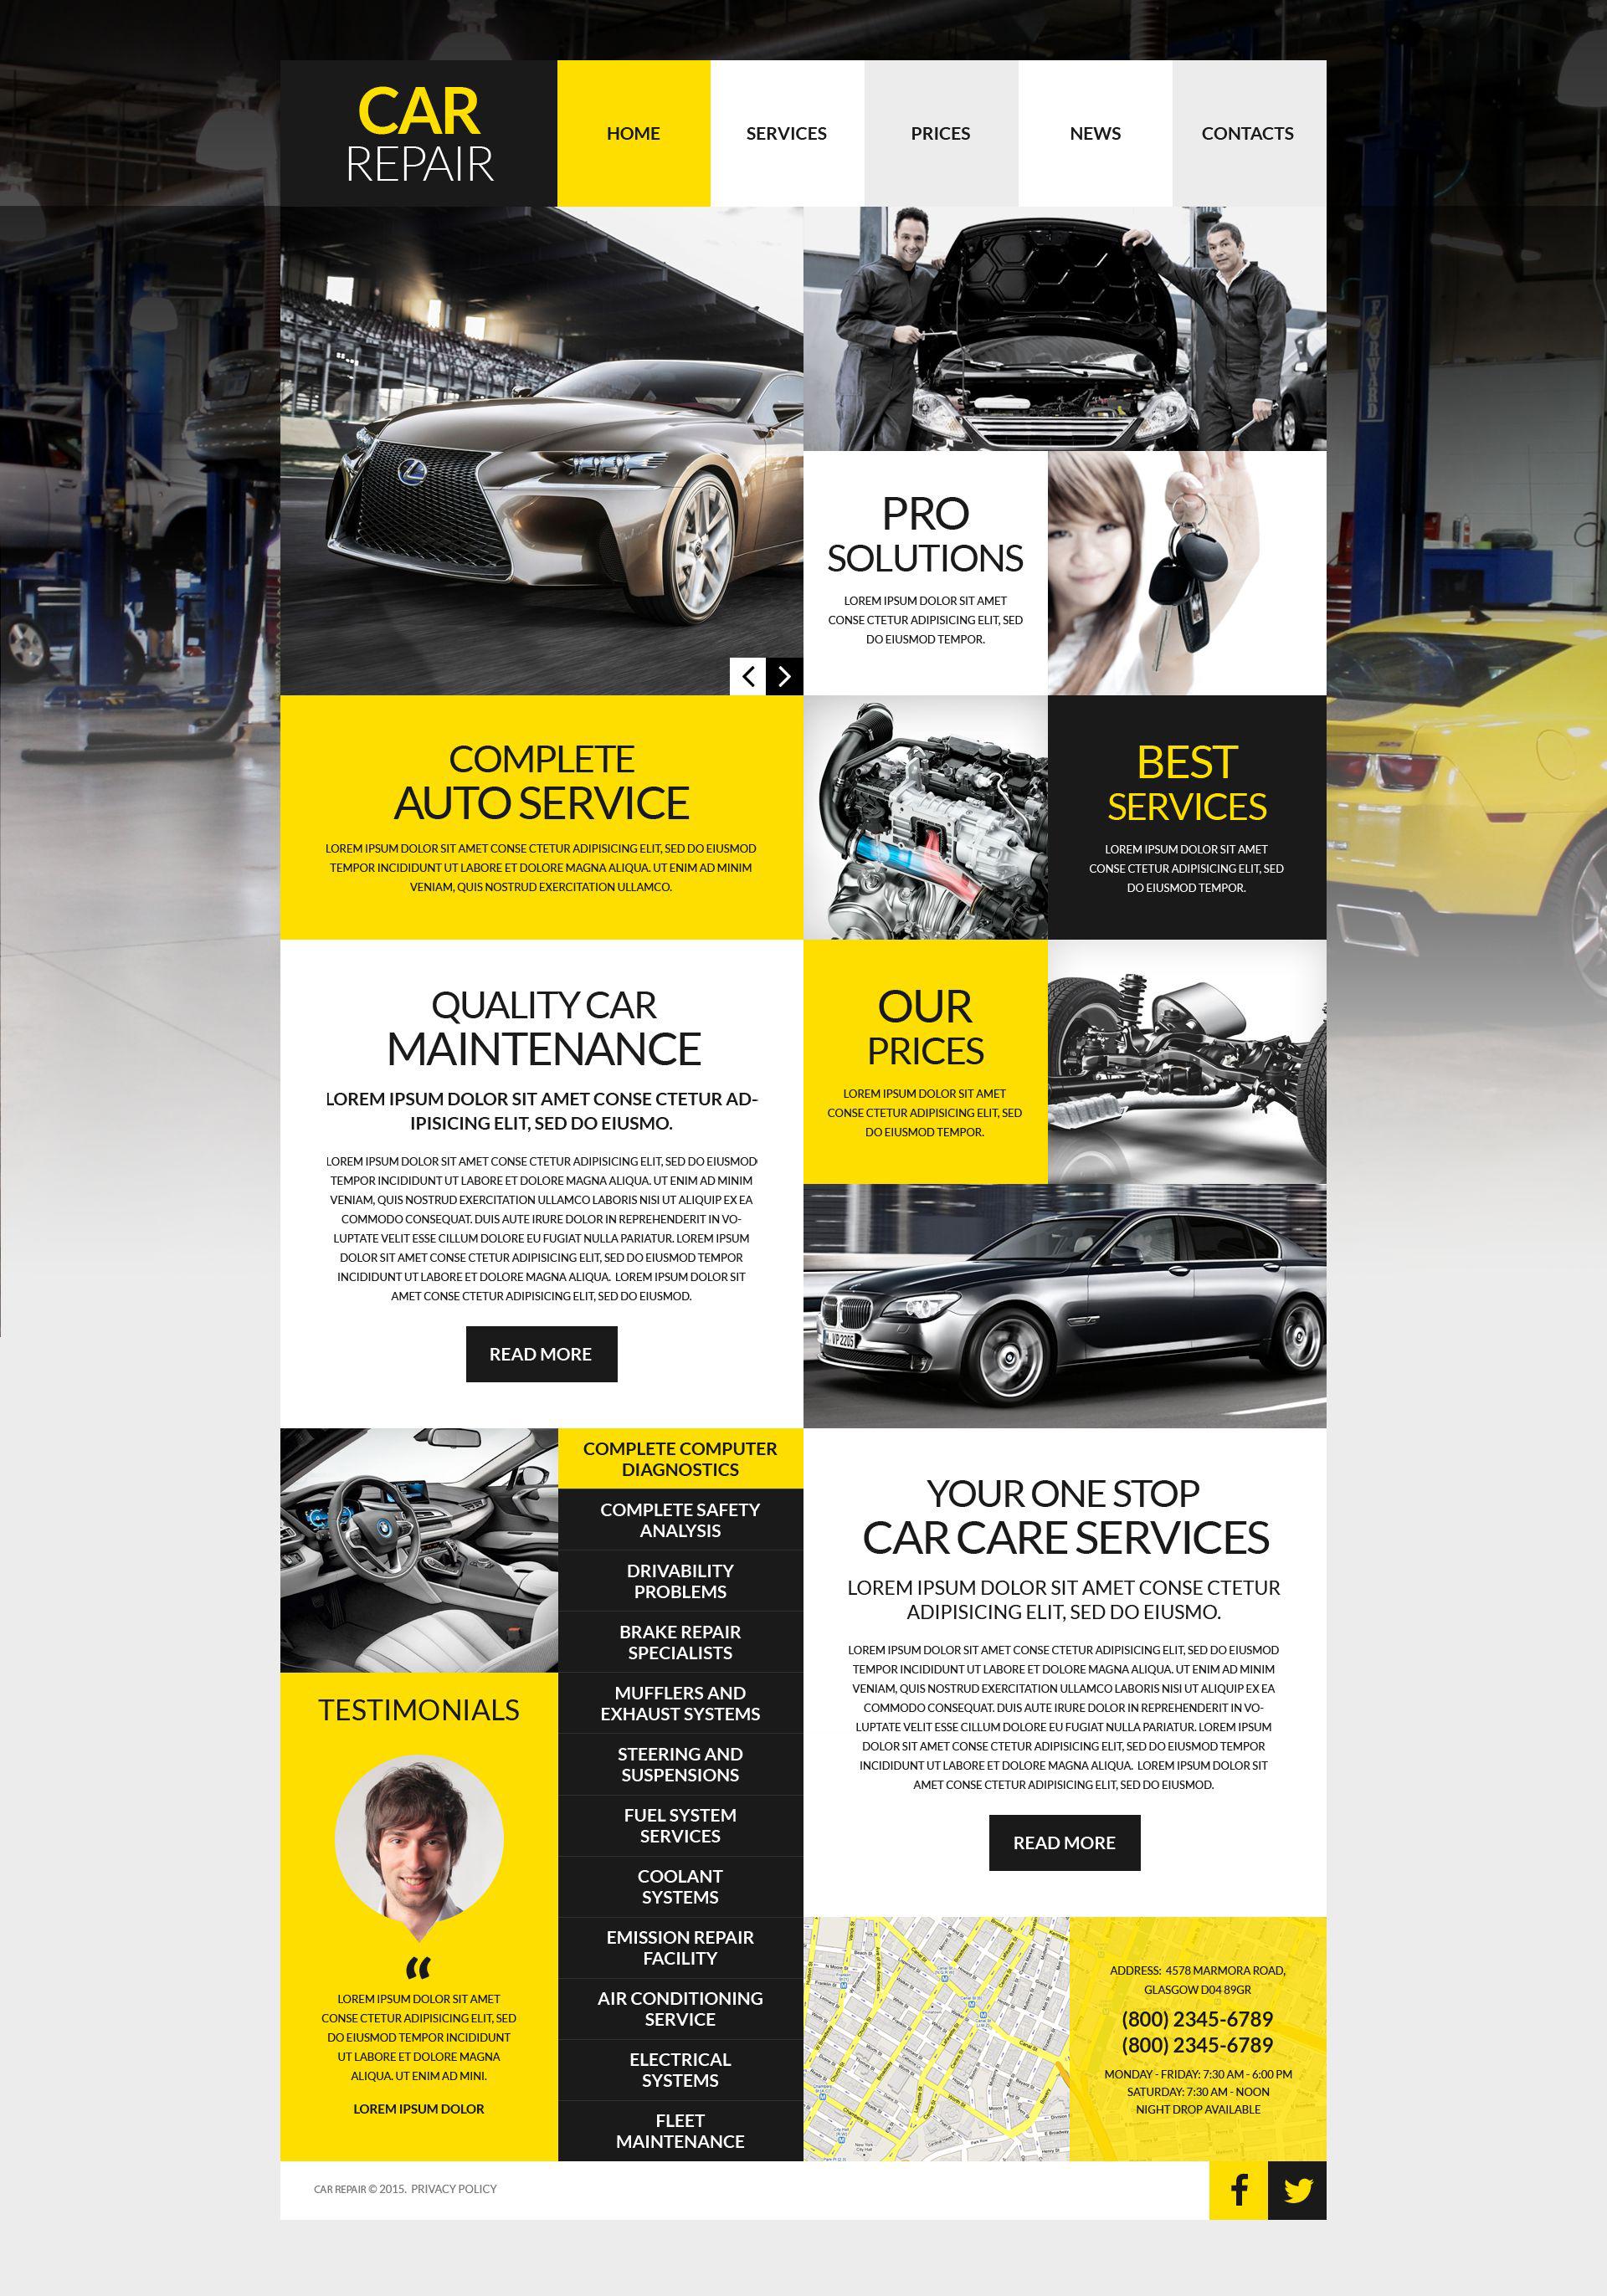 Plantillas WordPress para Sitios de Talleres de Reparación de Autos